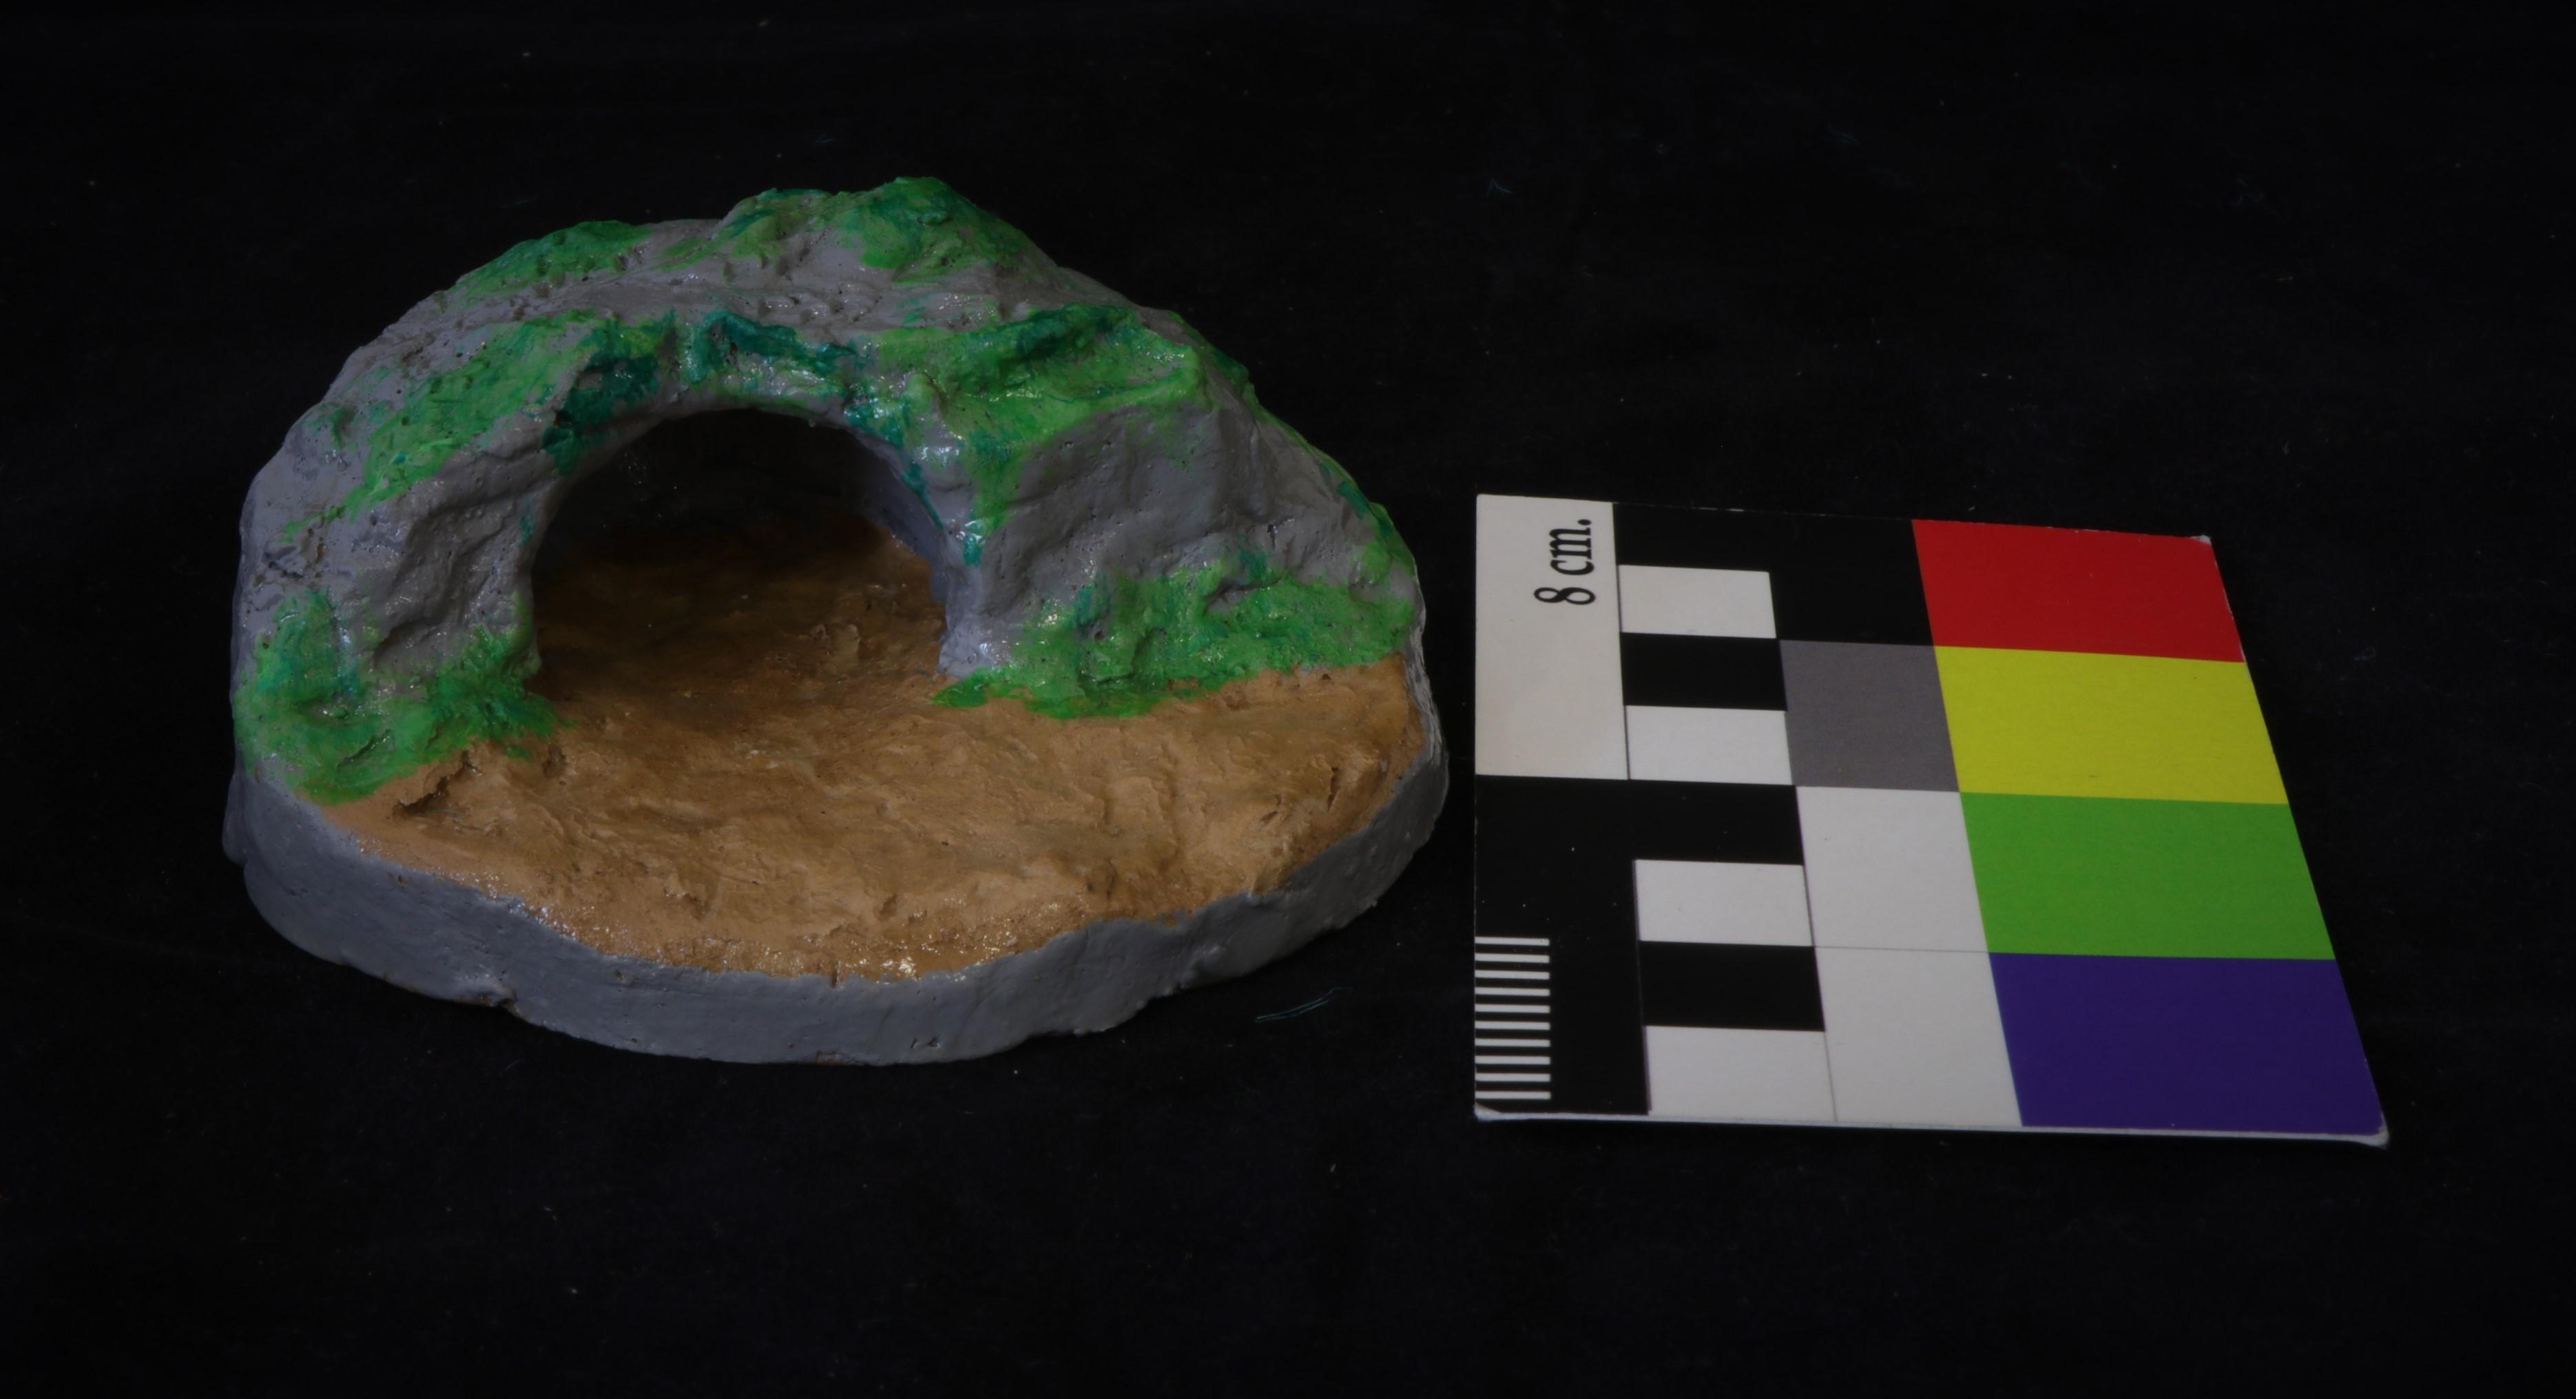 Cueva o caverna